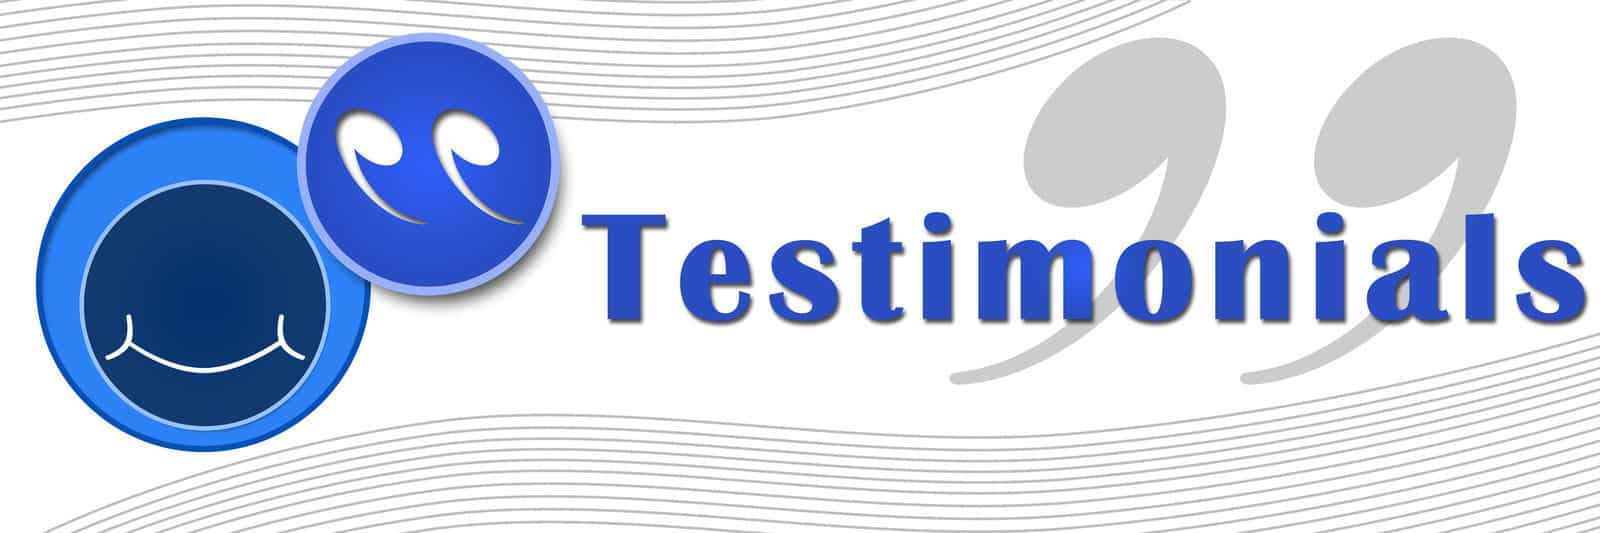 Client Feedback & Testimonials